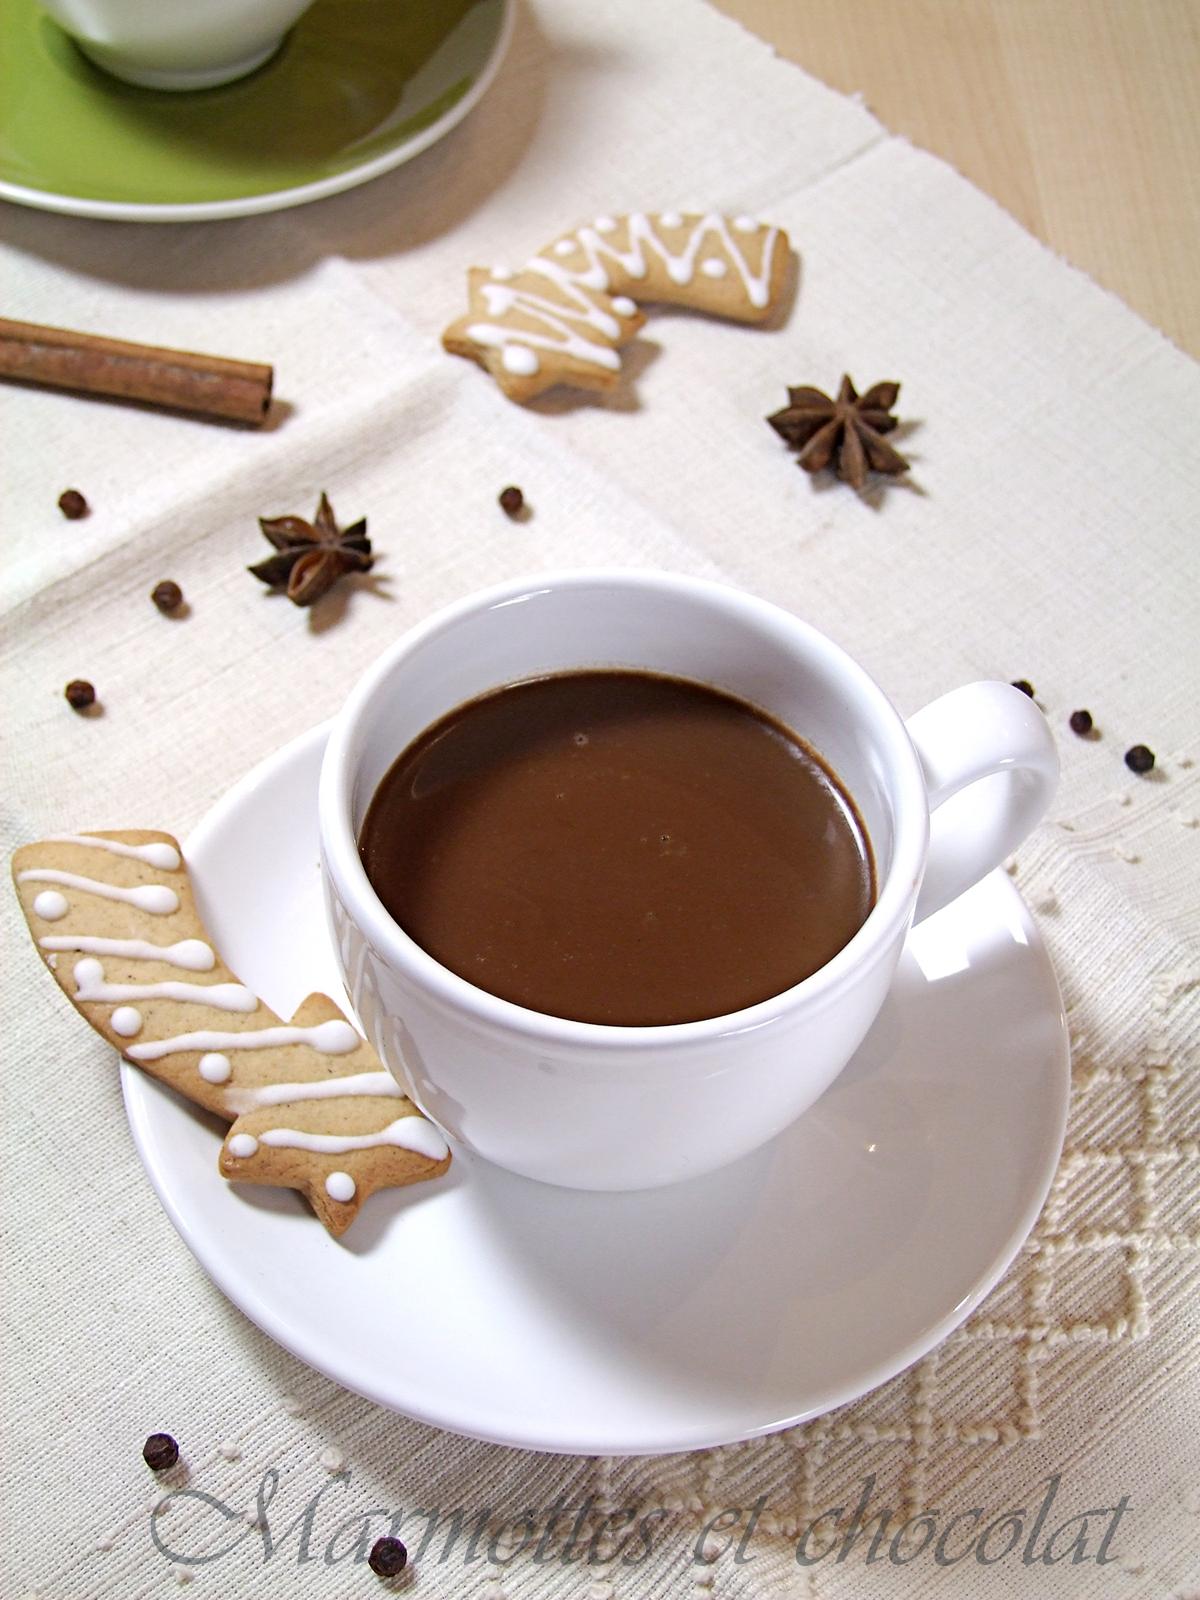 marmottes et chocolat chocolat chaud. Black Bedroom Furniture Sets. Home Design Ideas